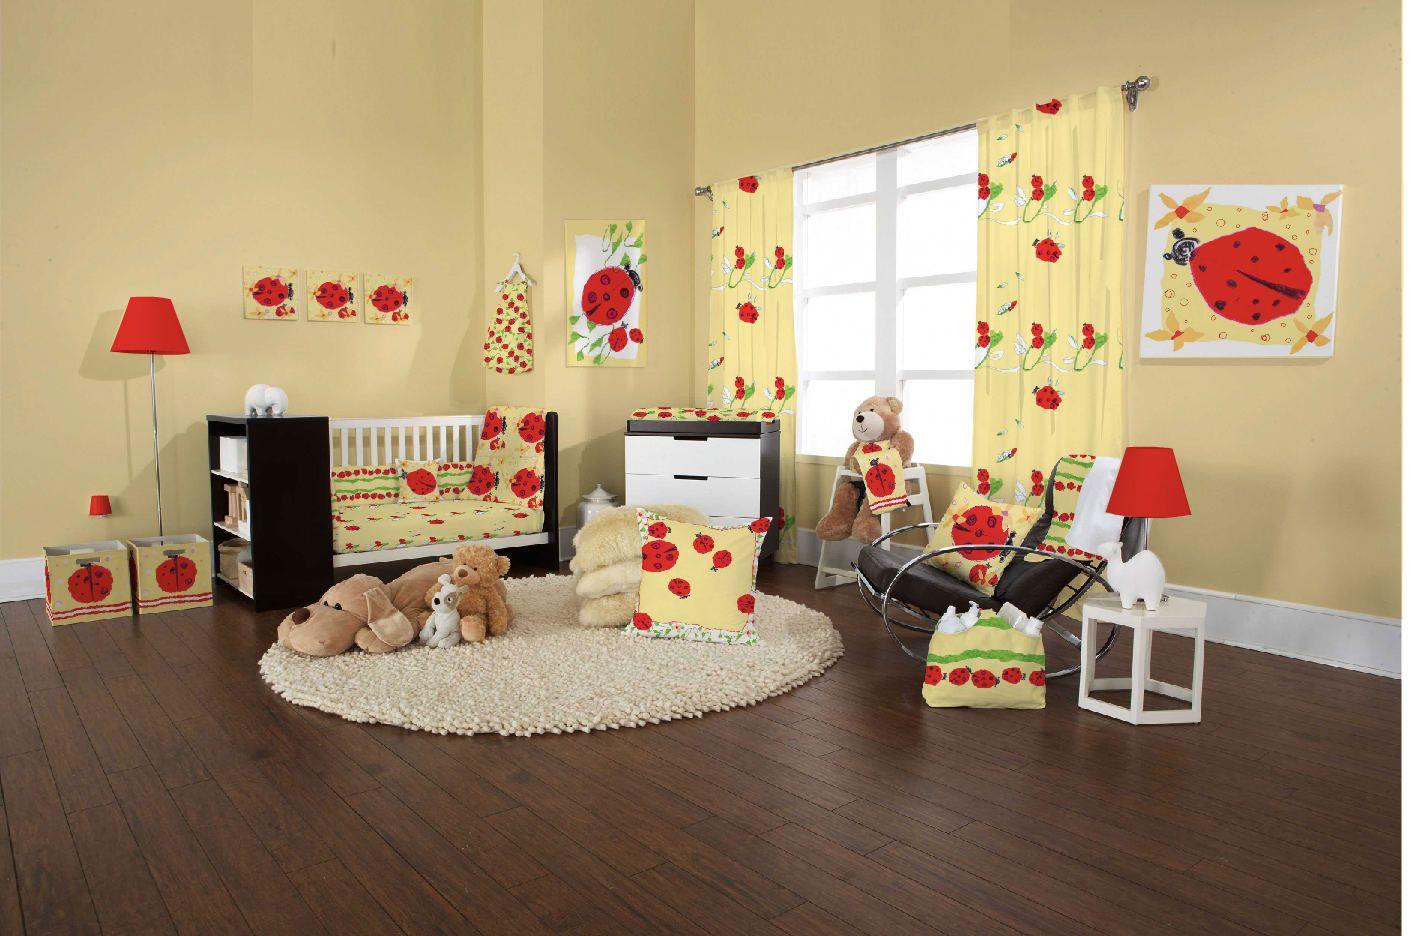 yellow ladybug nursery-room-decorations-unique-nursery ...